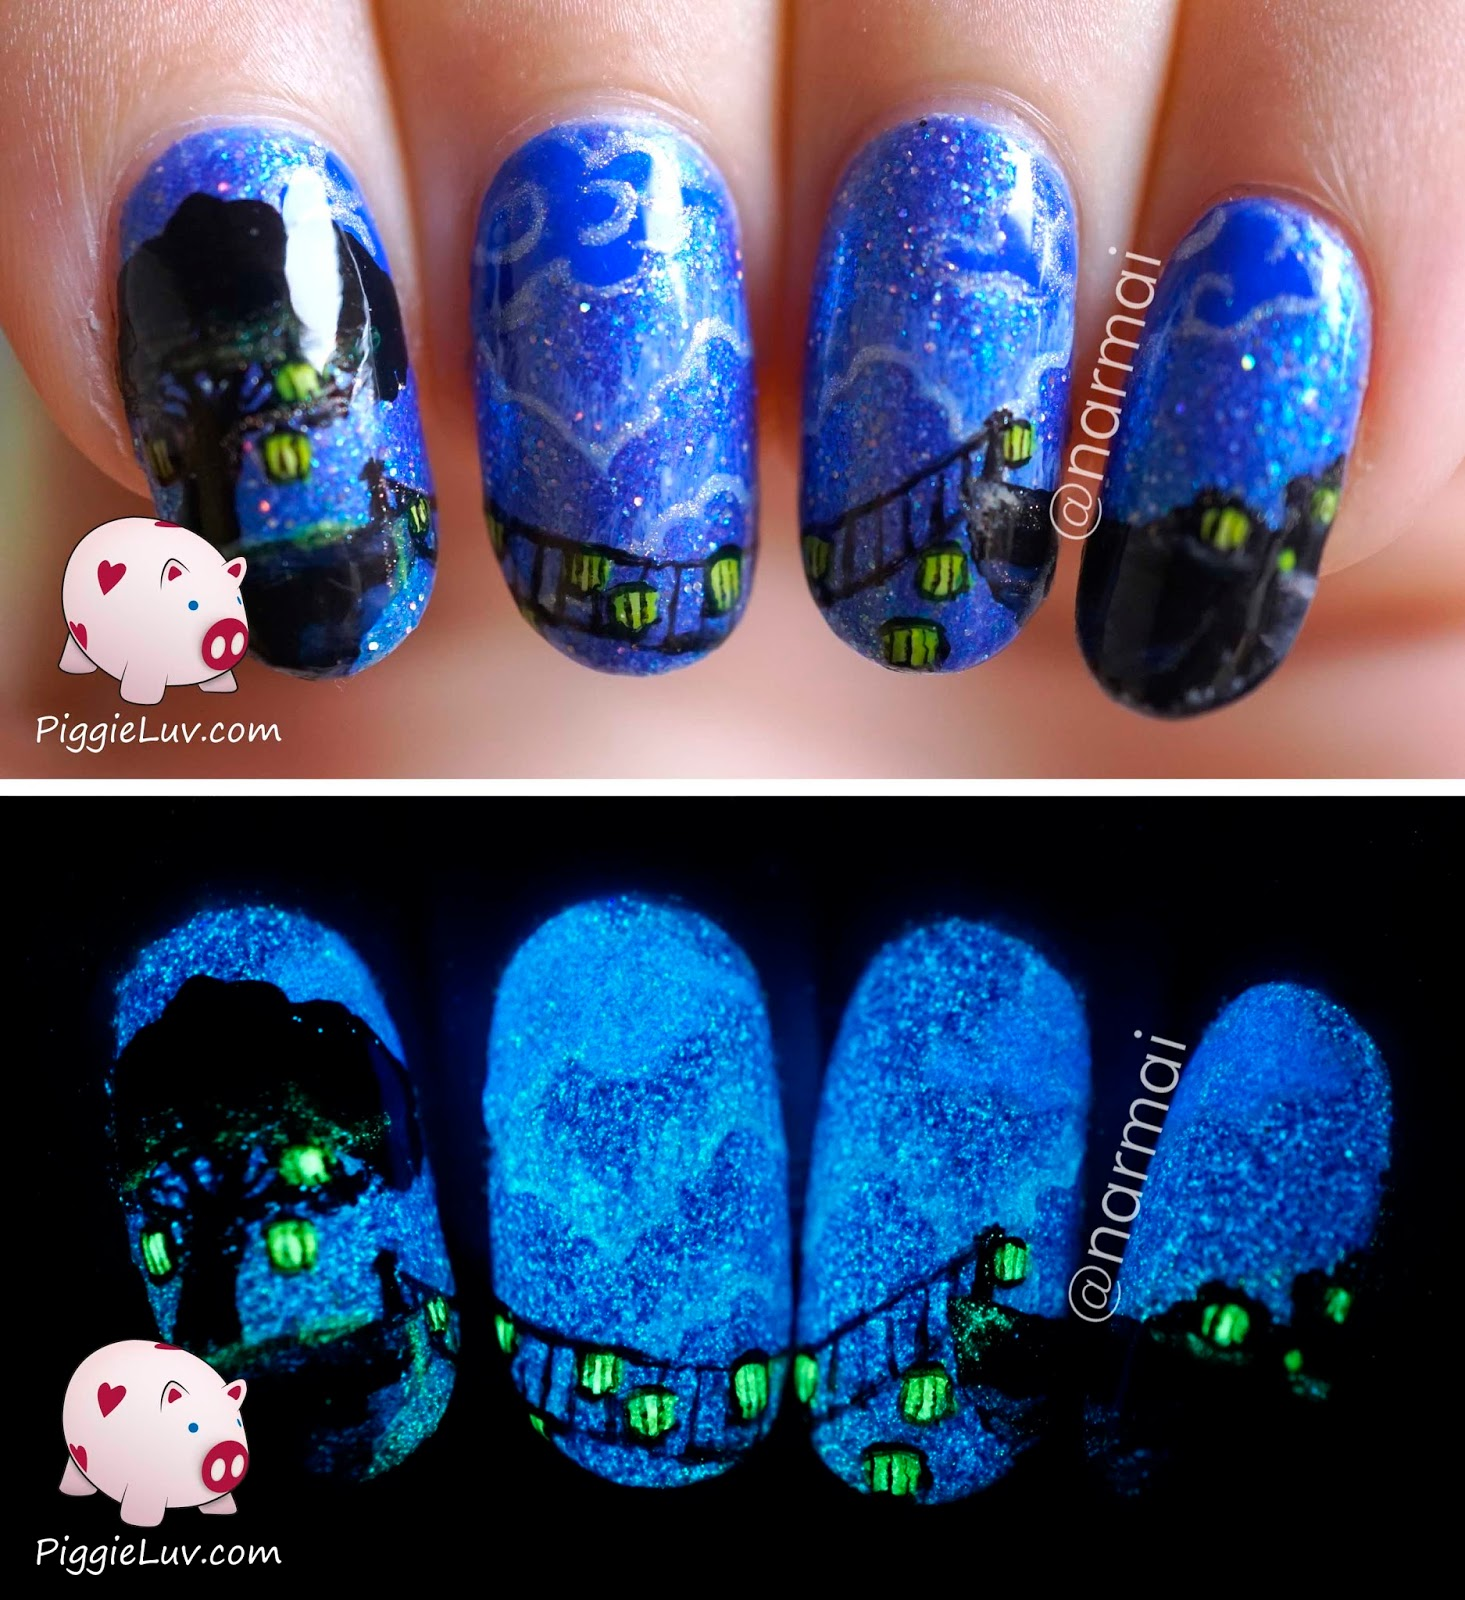 piggieluv glow in the dark bridge nail art painted with